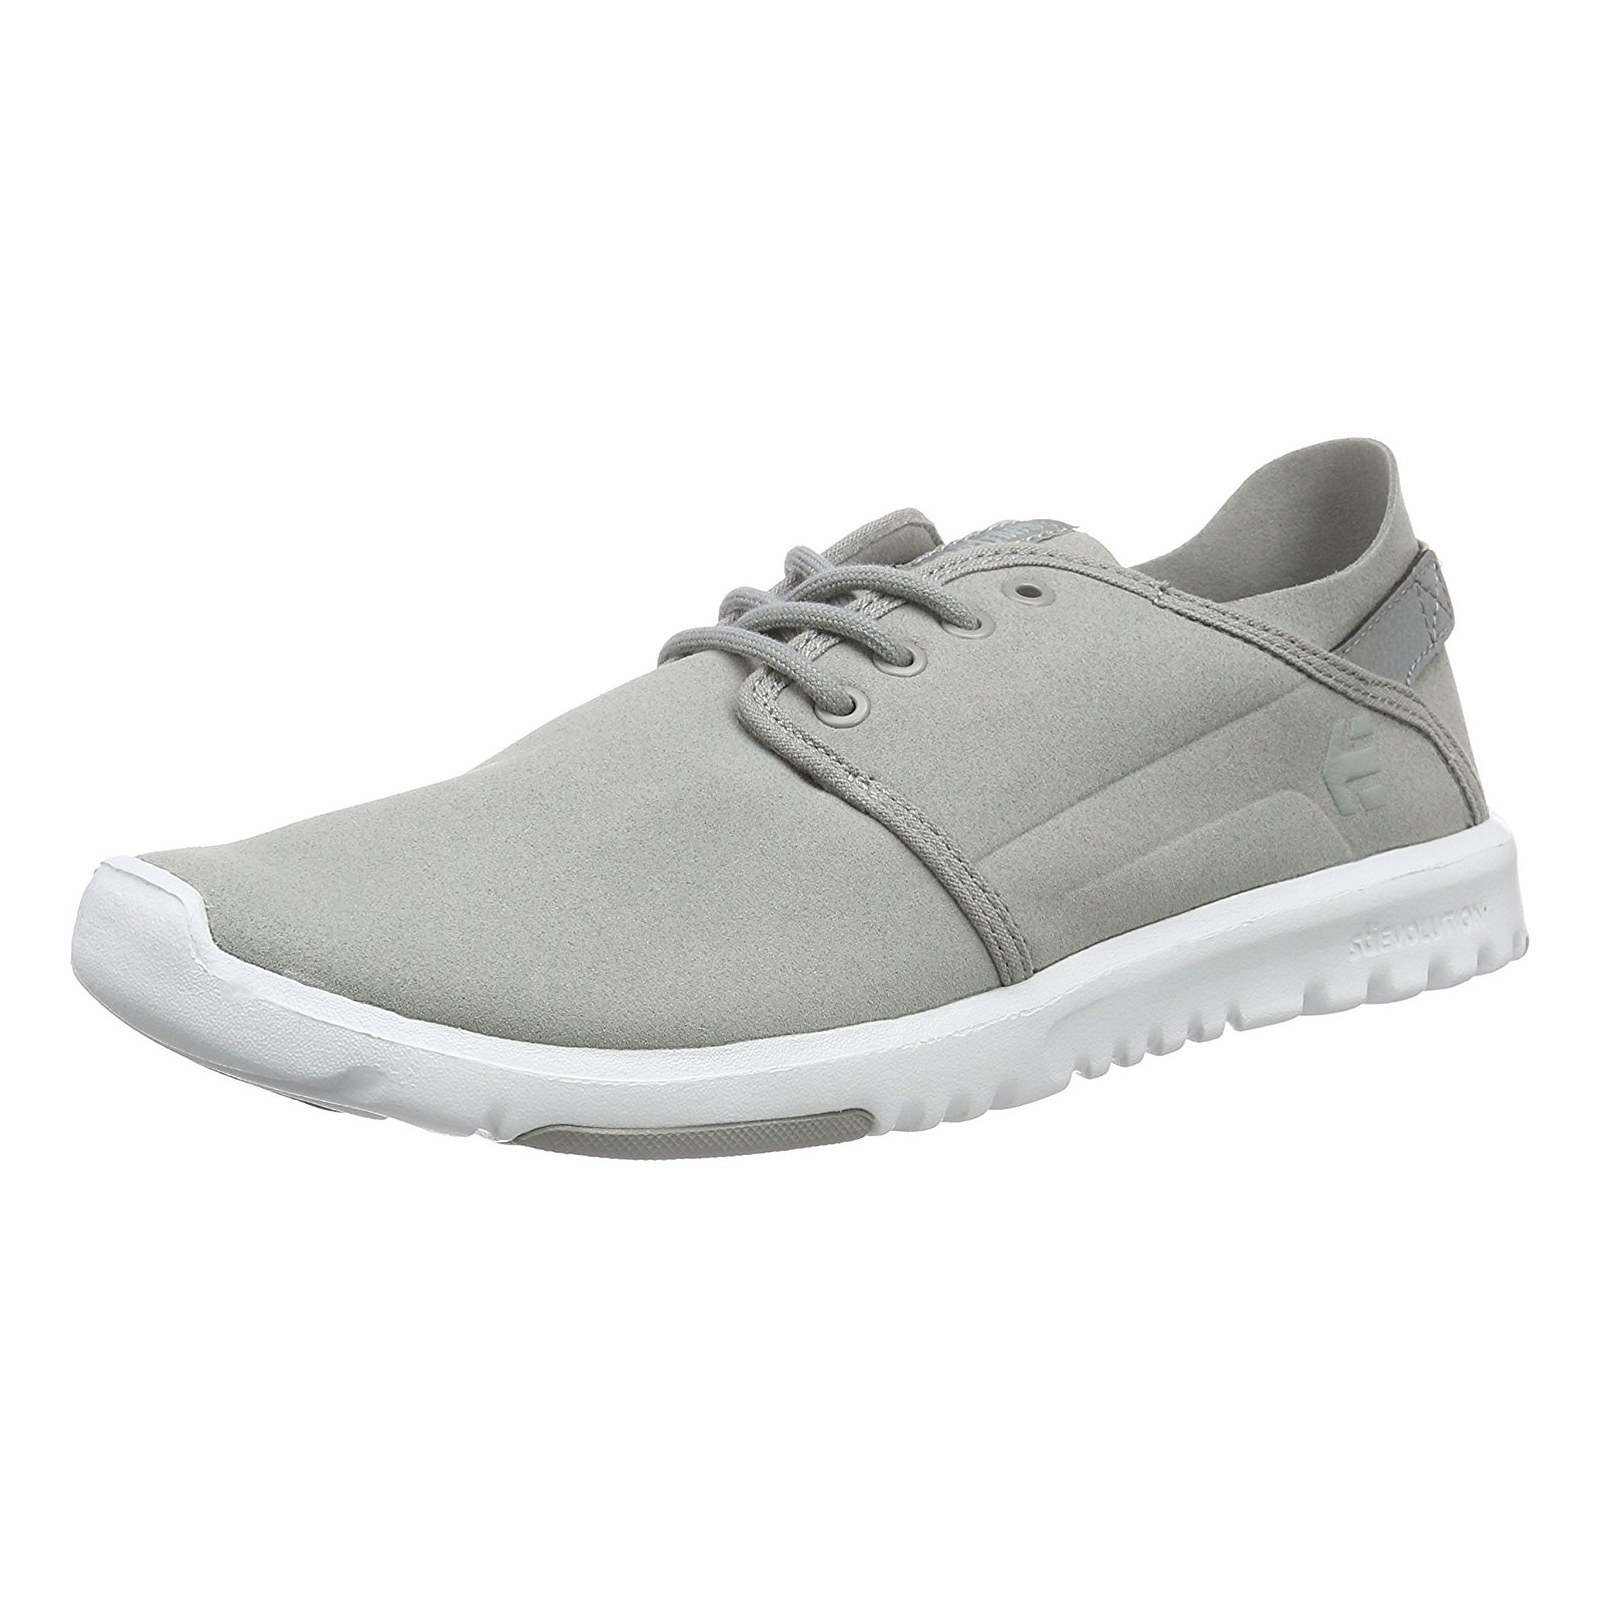 Etnies Sneakers Scout Grey Light Grey grey